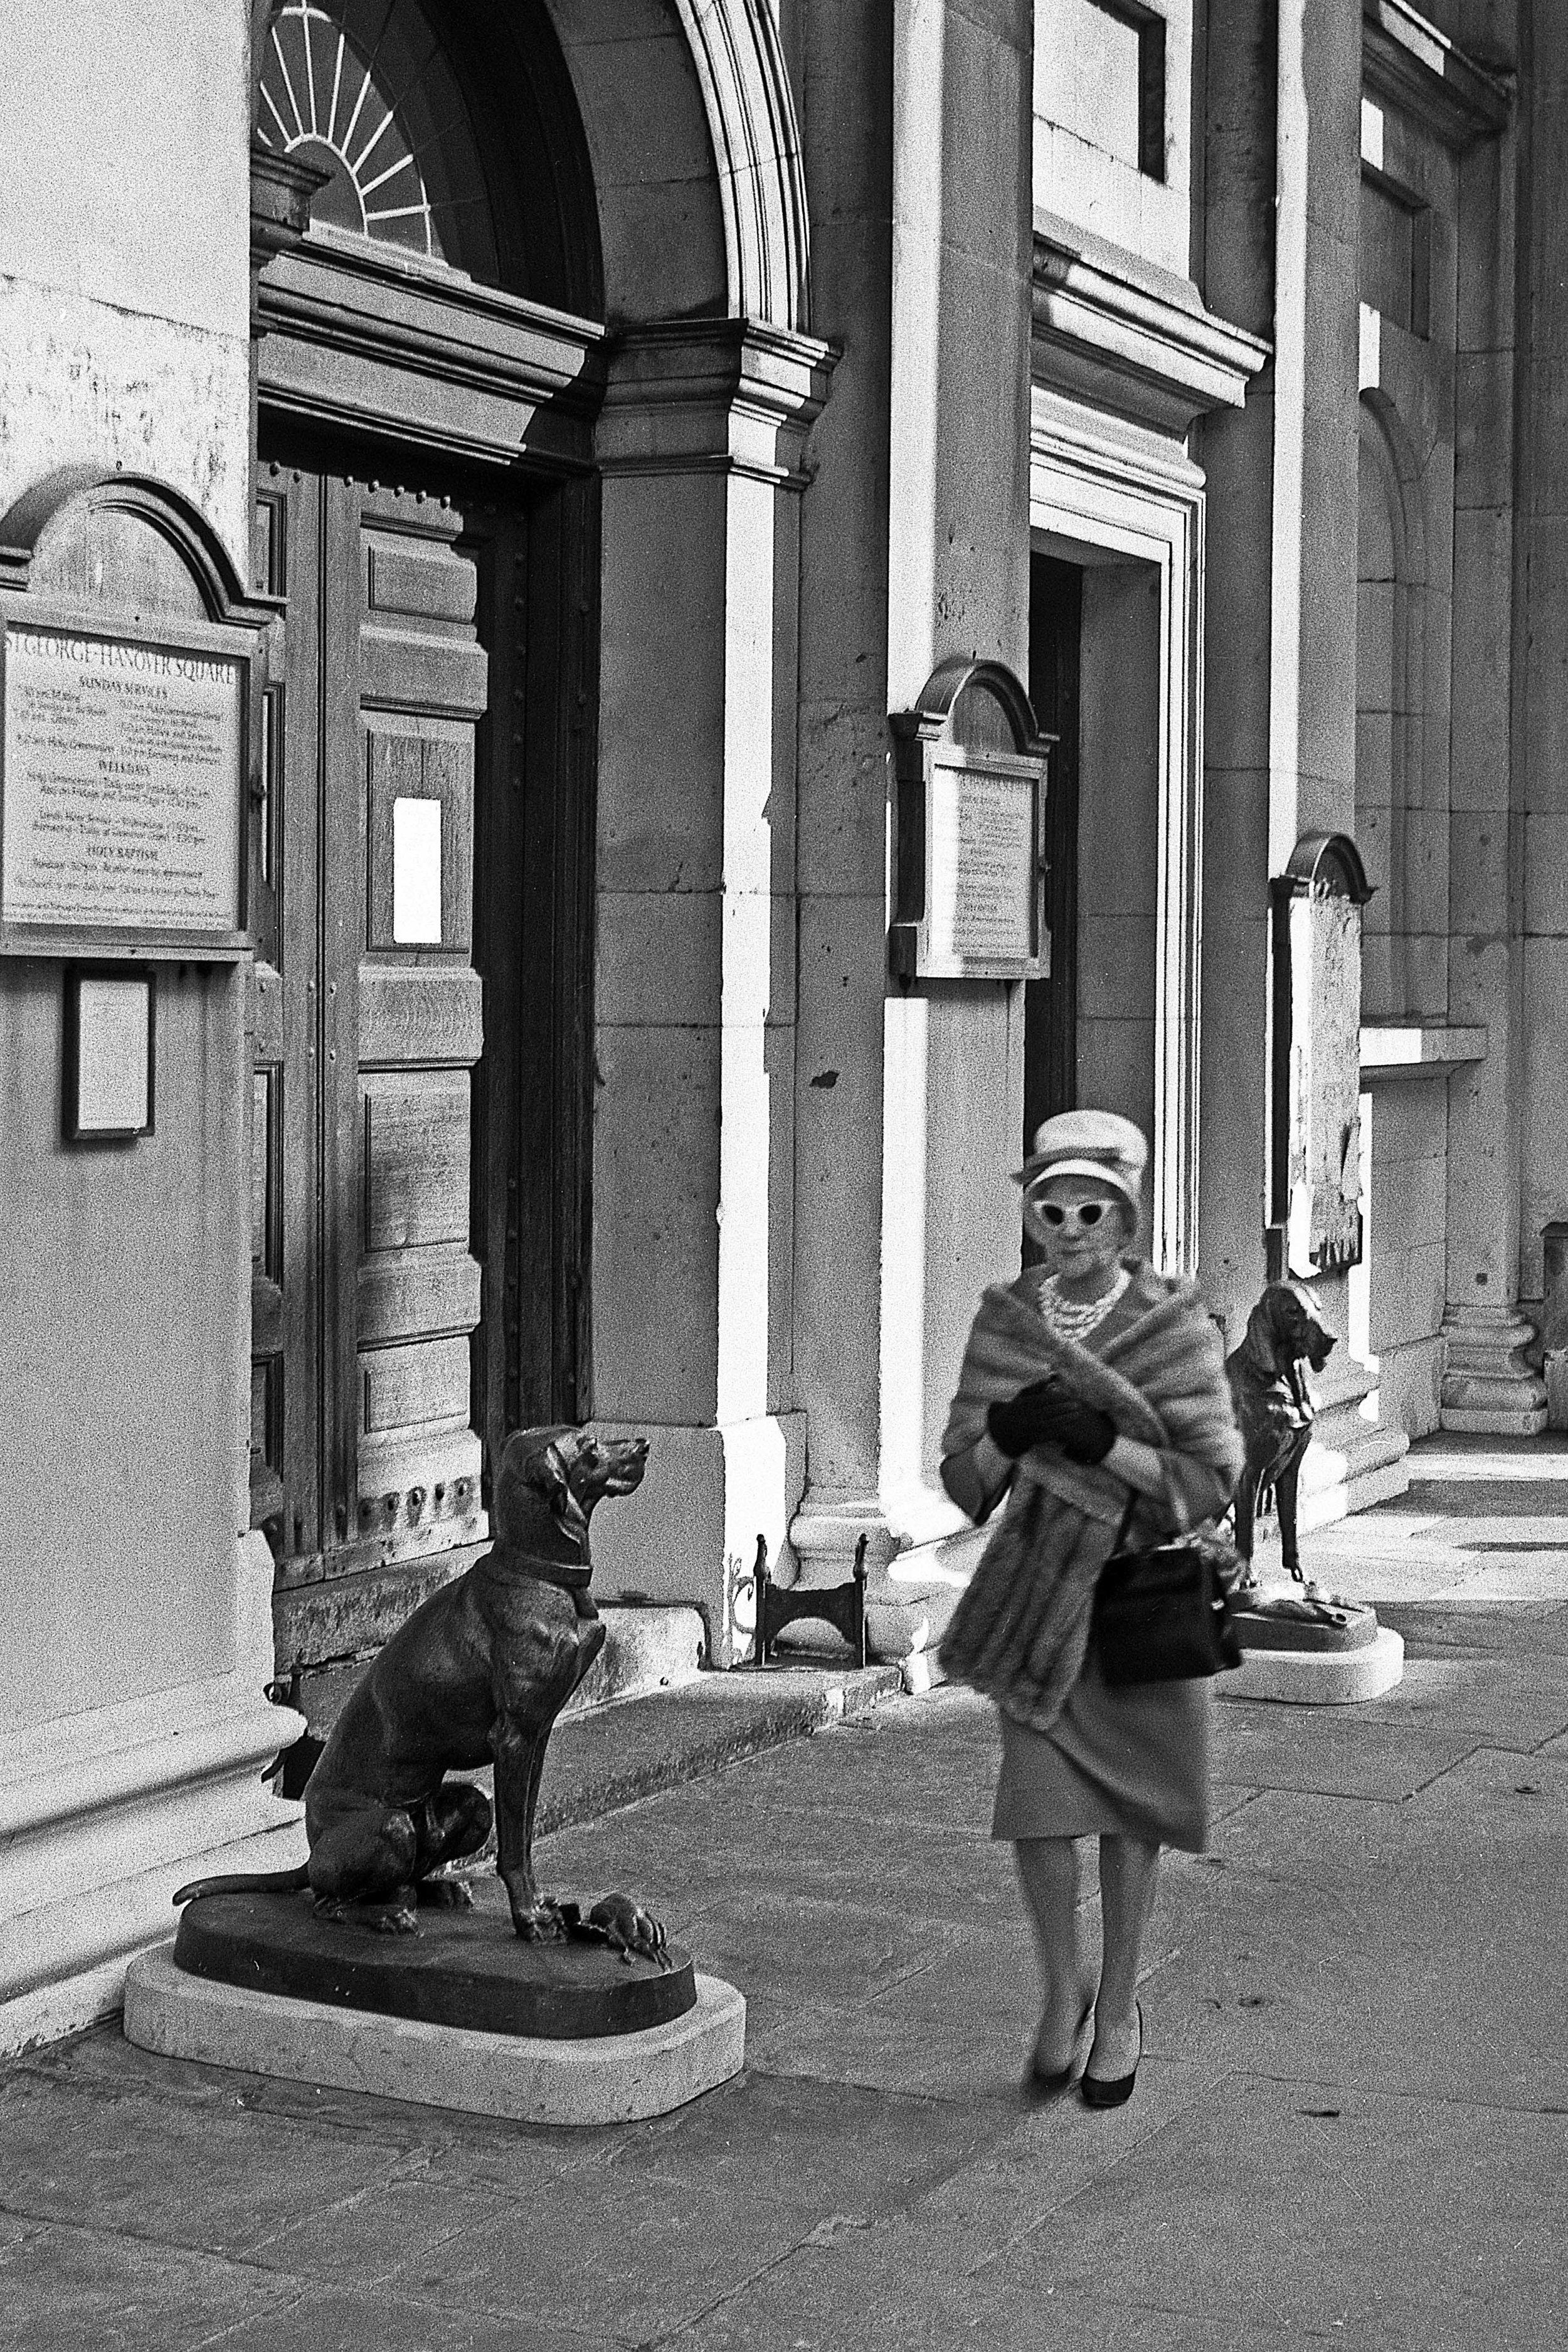 St. John's Smith Square, c. 1950s